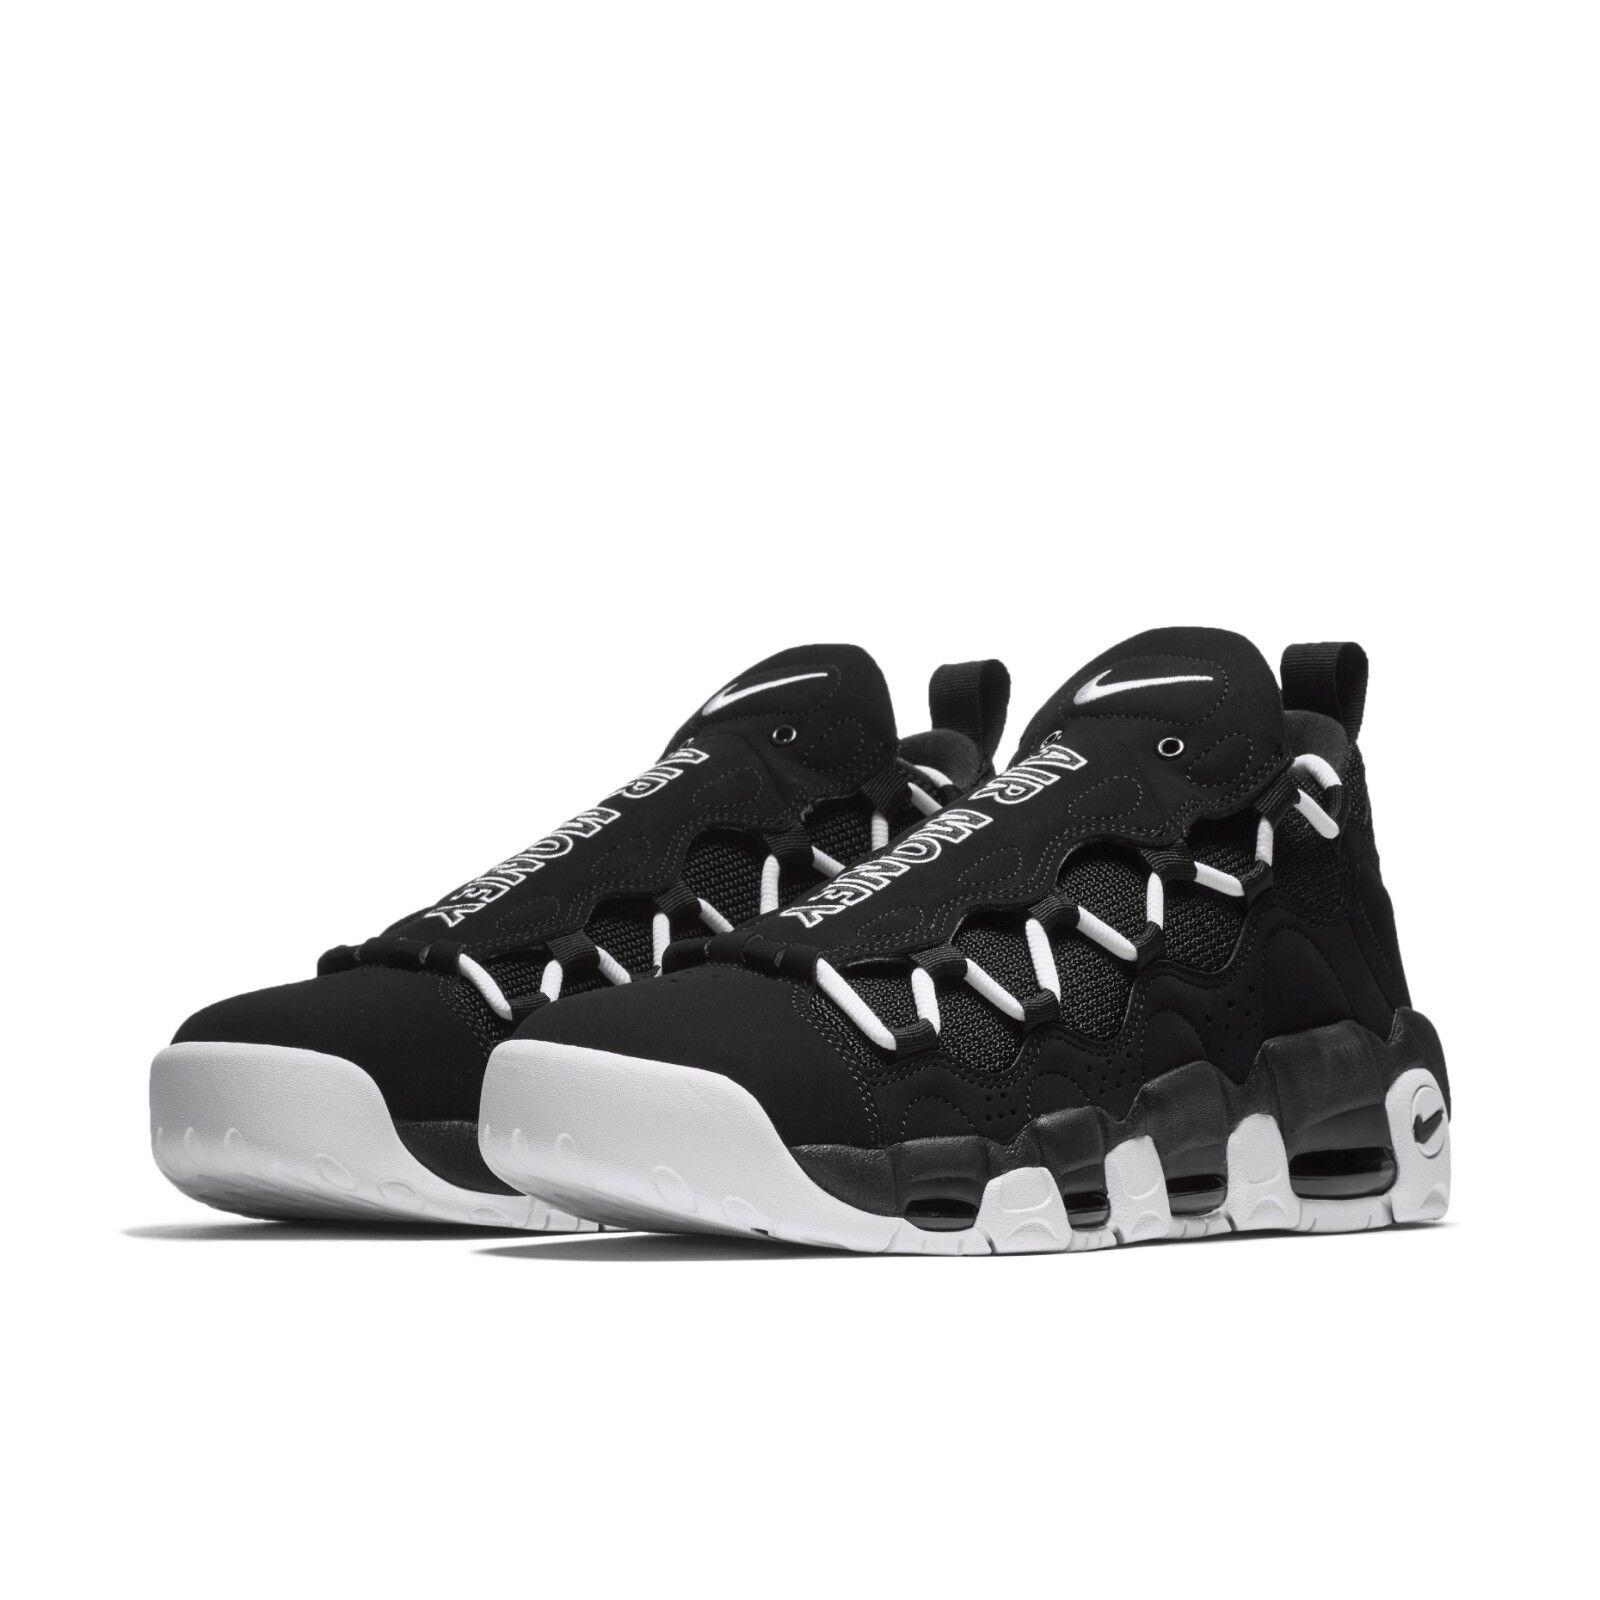 Nike Mens Air More Money Black White Reggie Miller Retro Sneakers AJ2998-001 Cheap women's shoes women's shoes